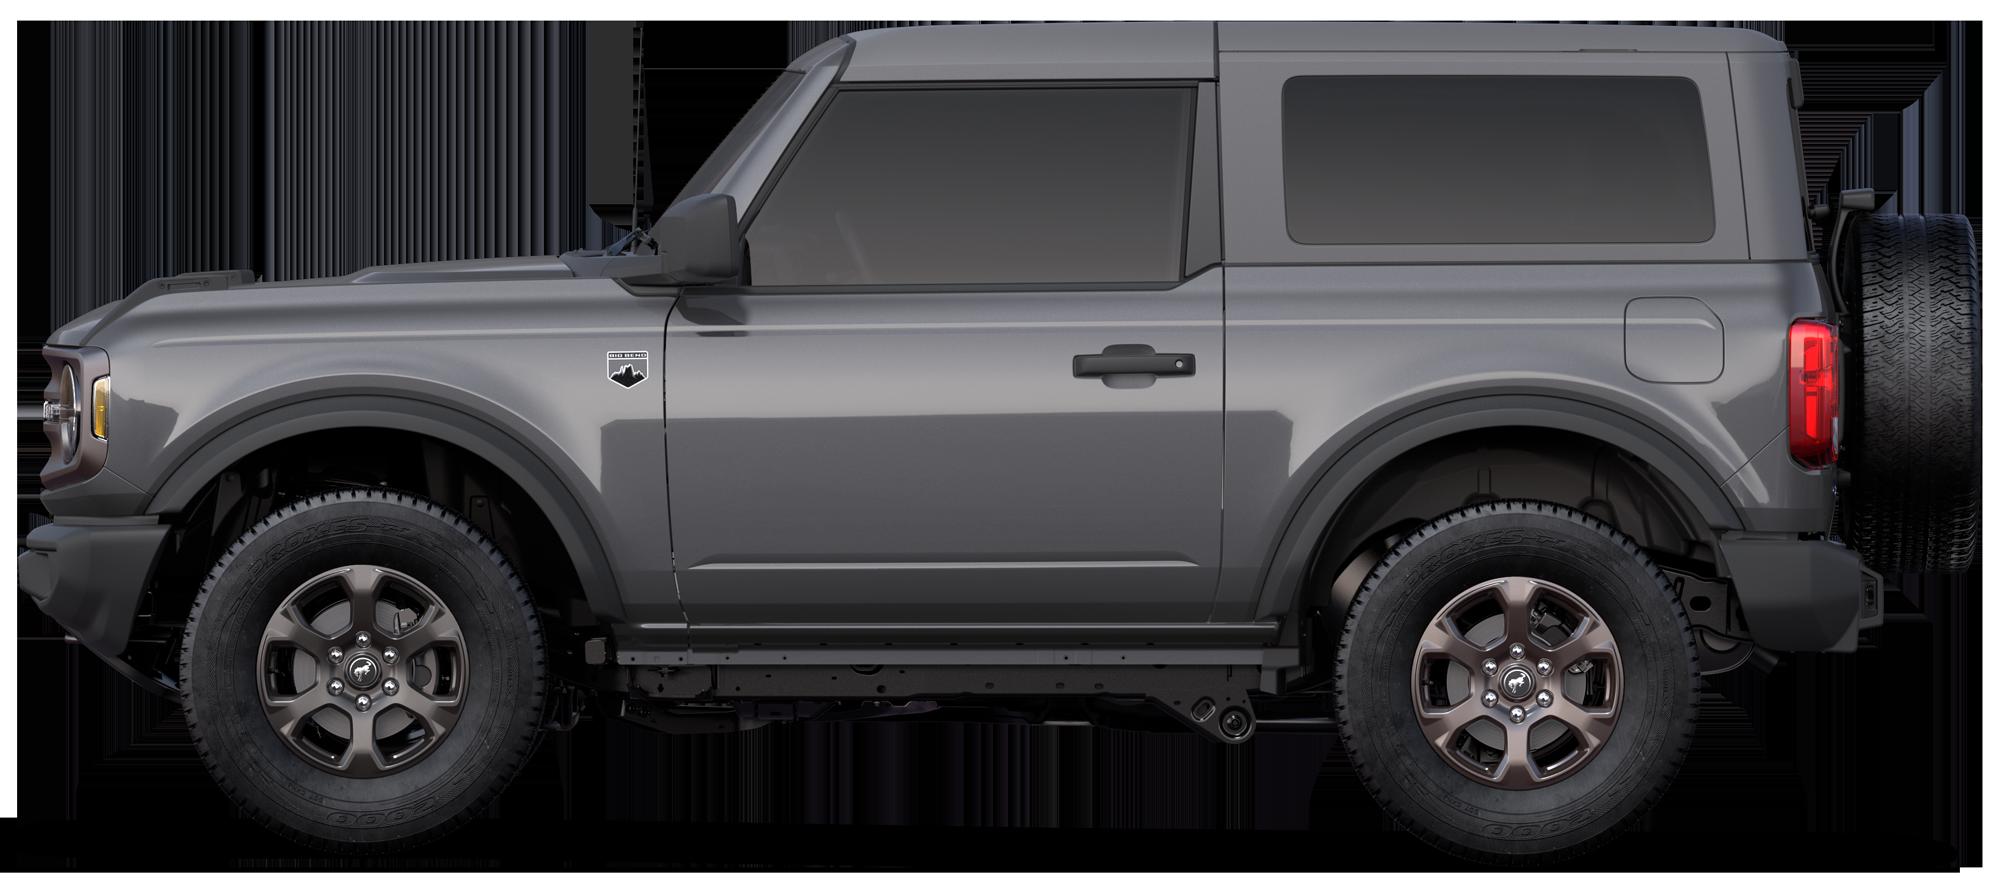 2021 Ford Bronco SUV Big Bend